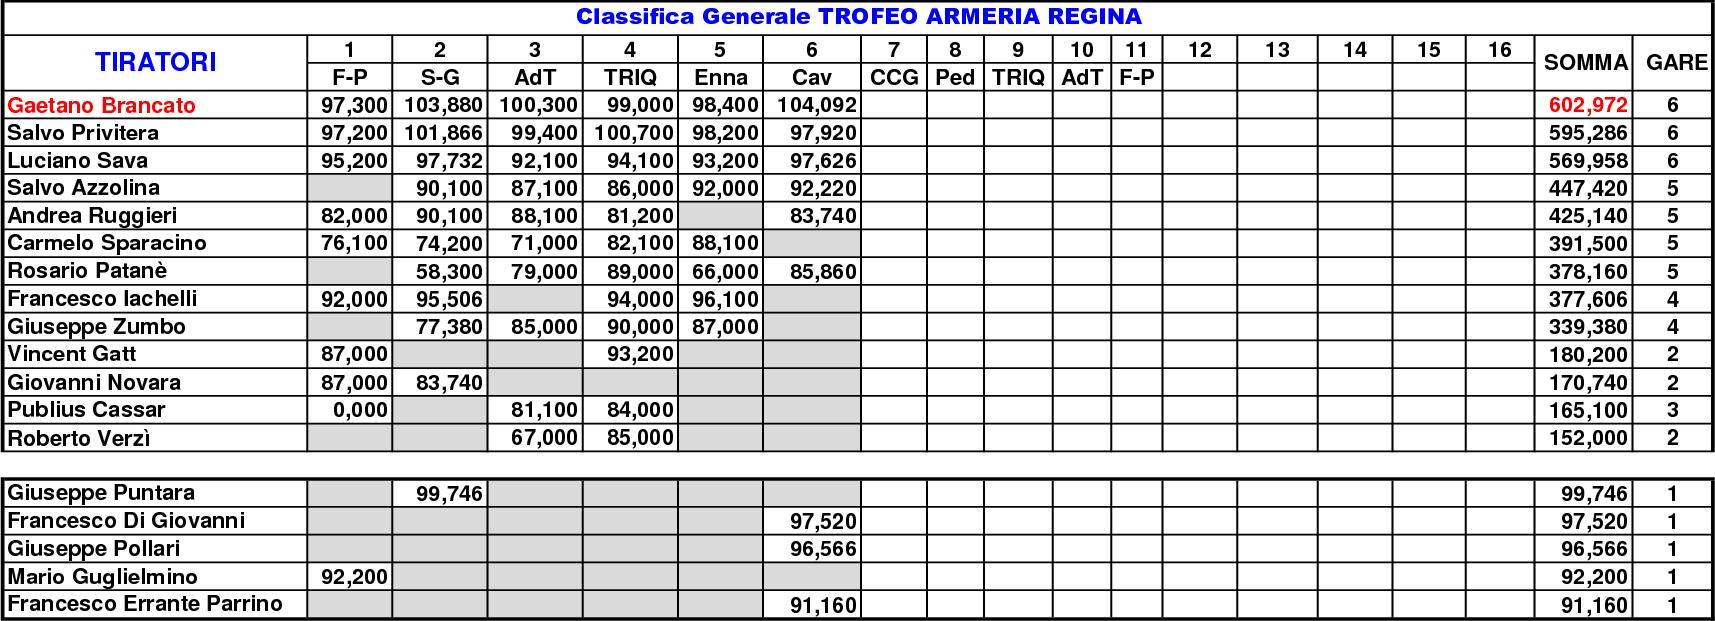 Classifica Generale 202116